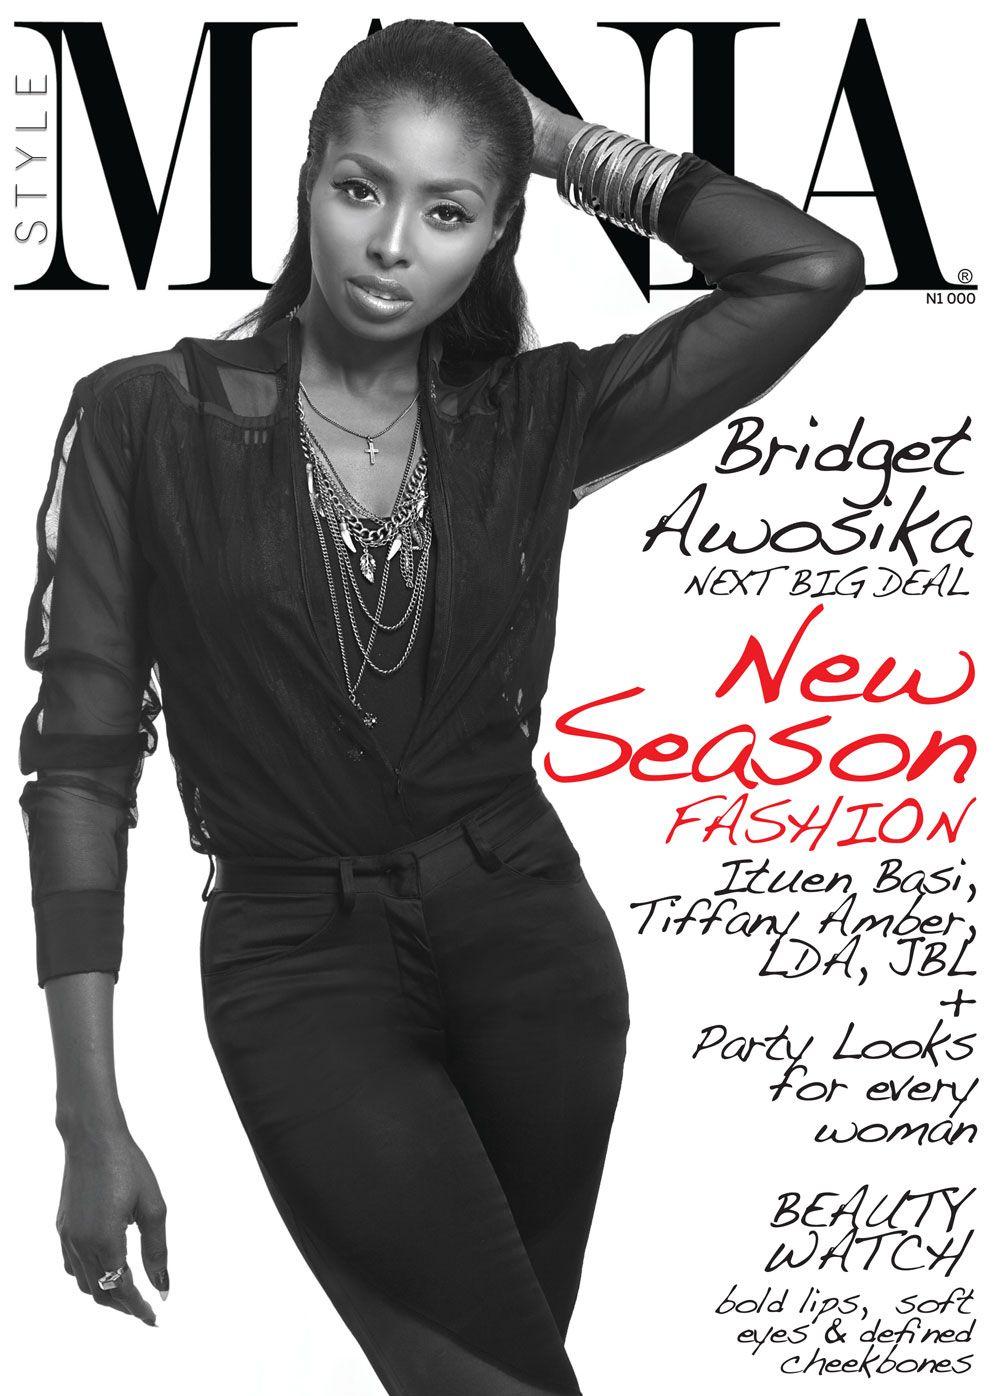 Style Mania (1) Bridget Awosika